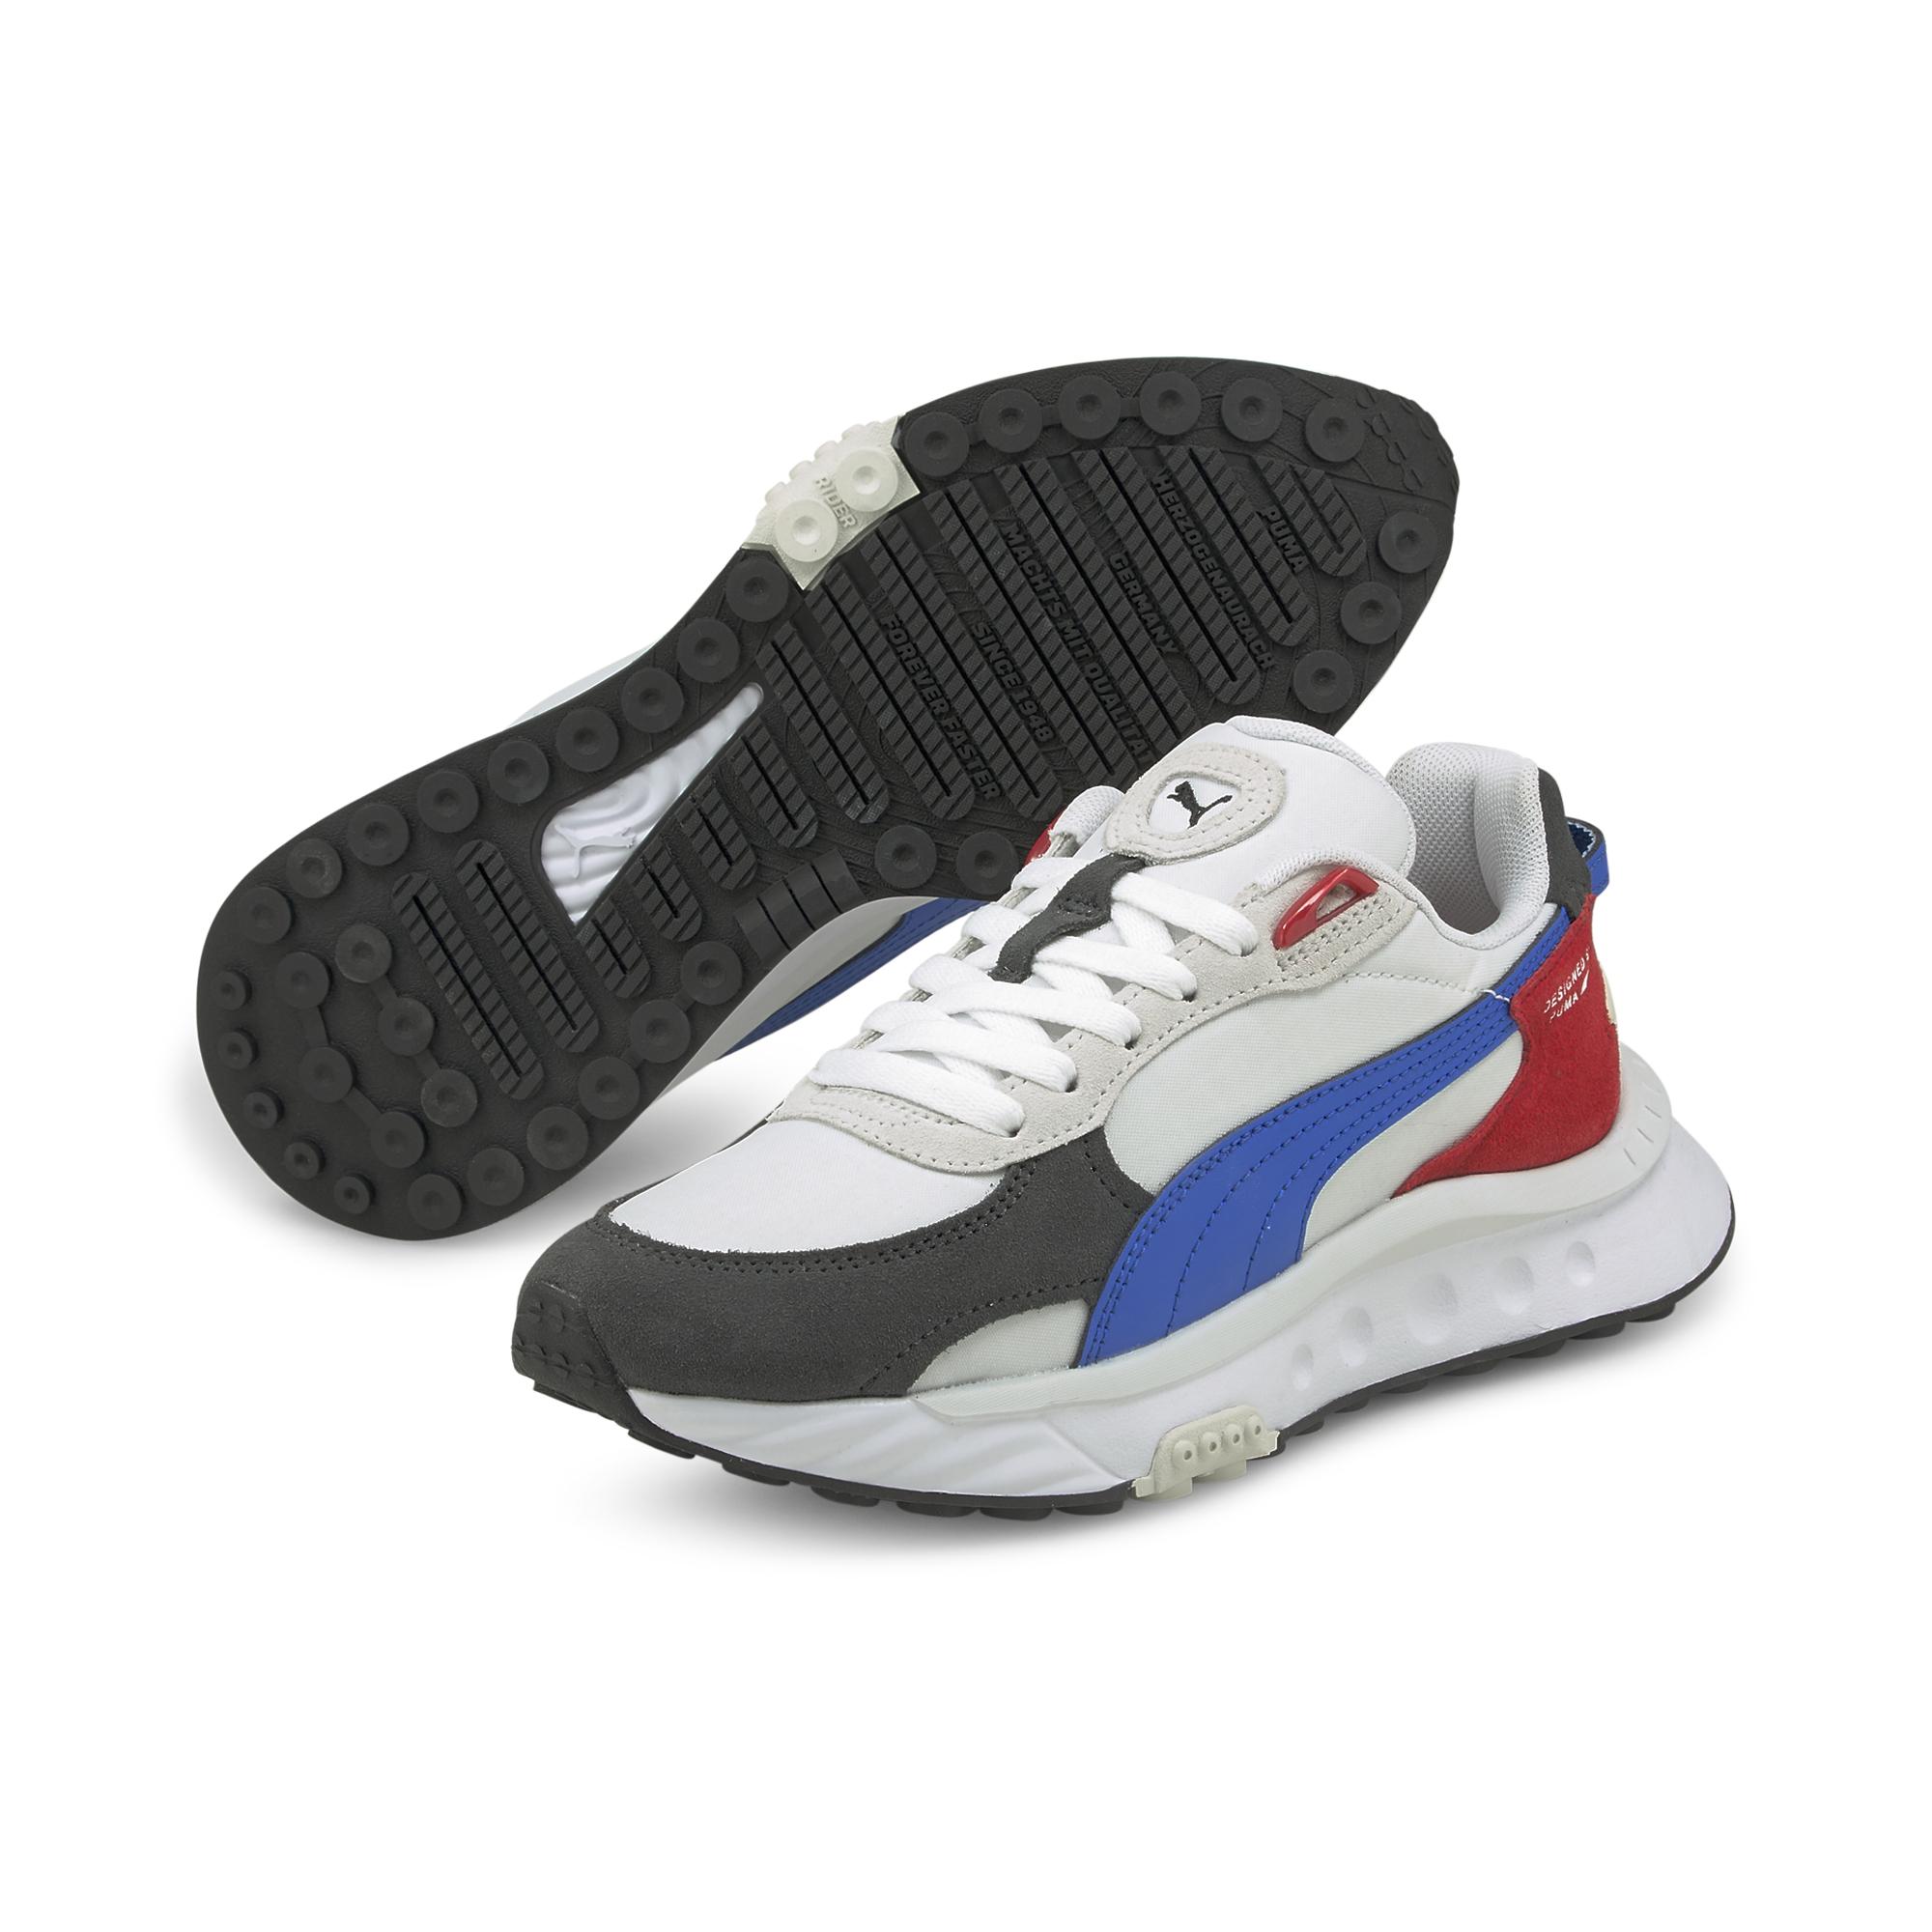 Puma Wild Rider Rollin' Junior Sneakers, Ebony, 36